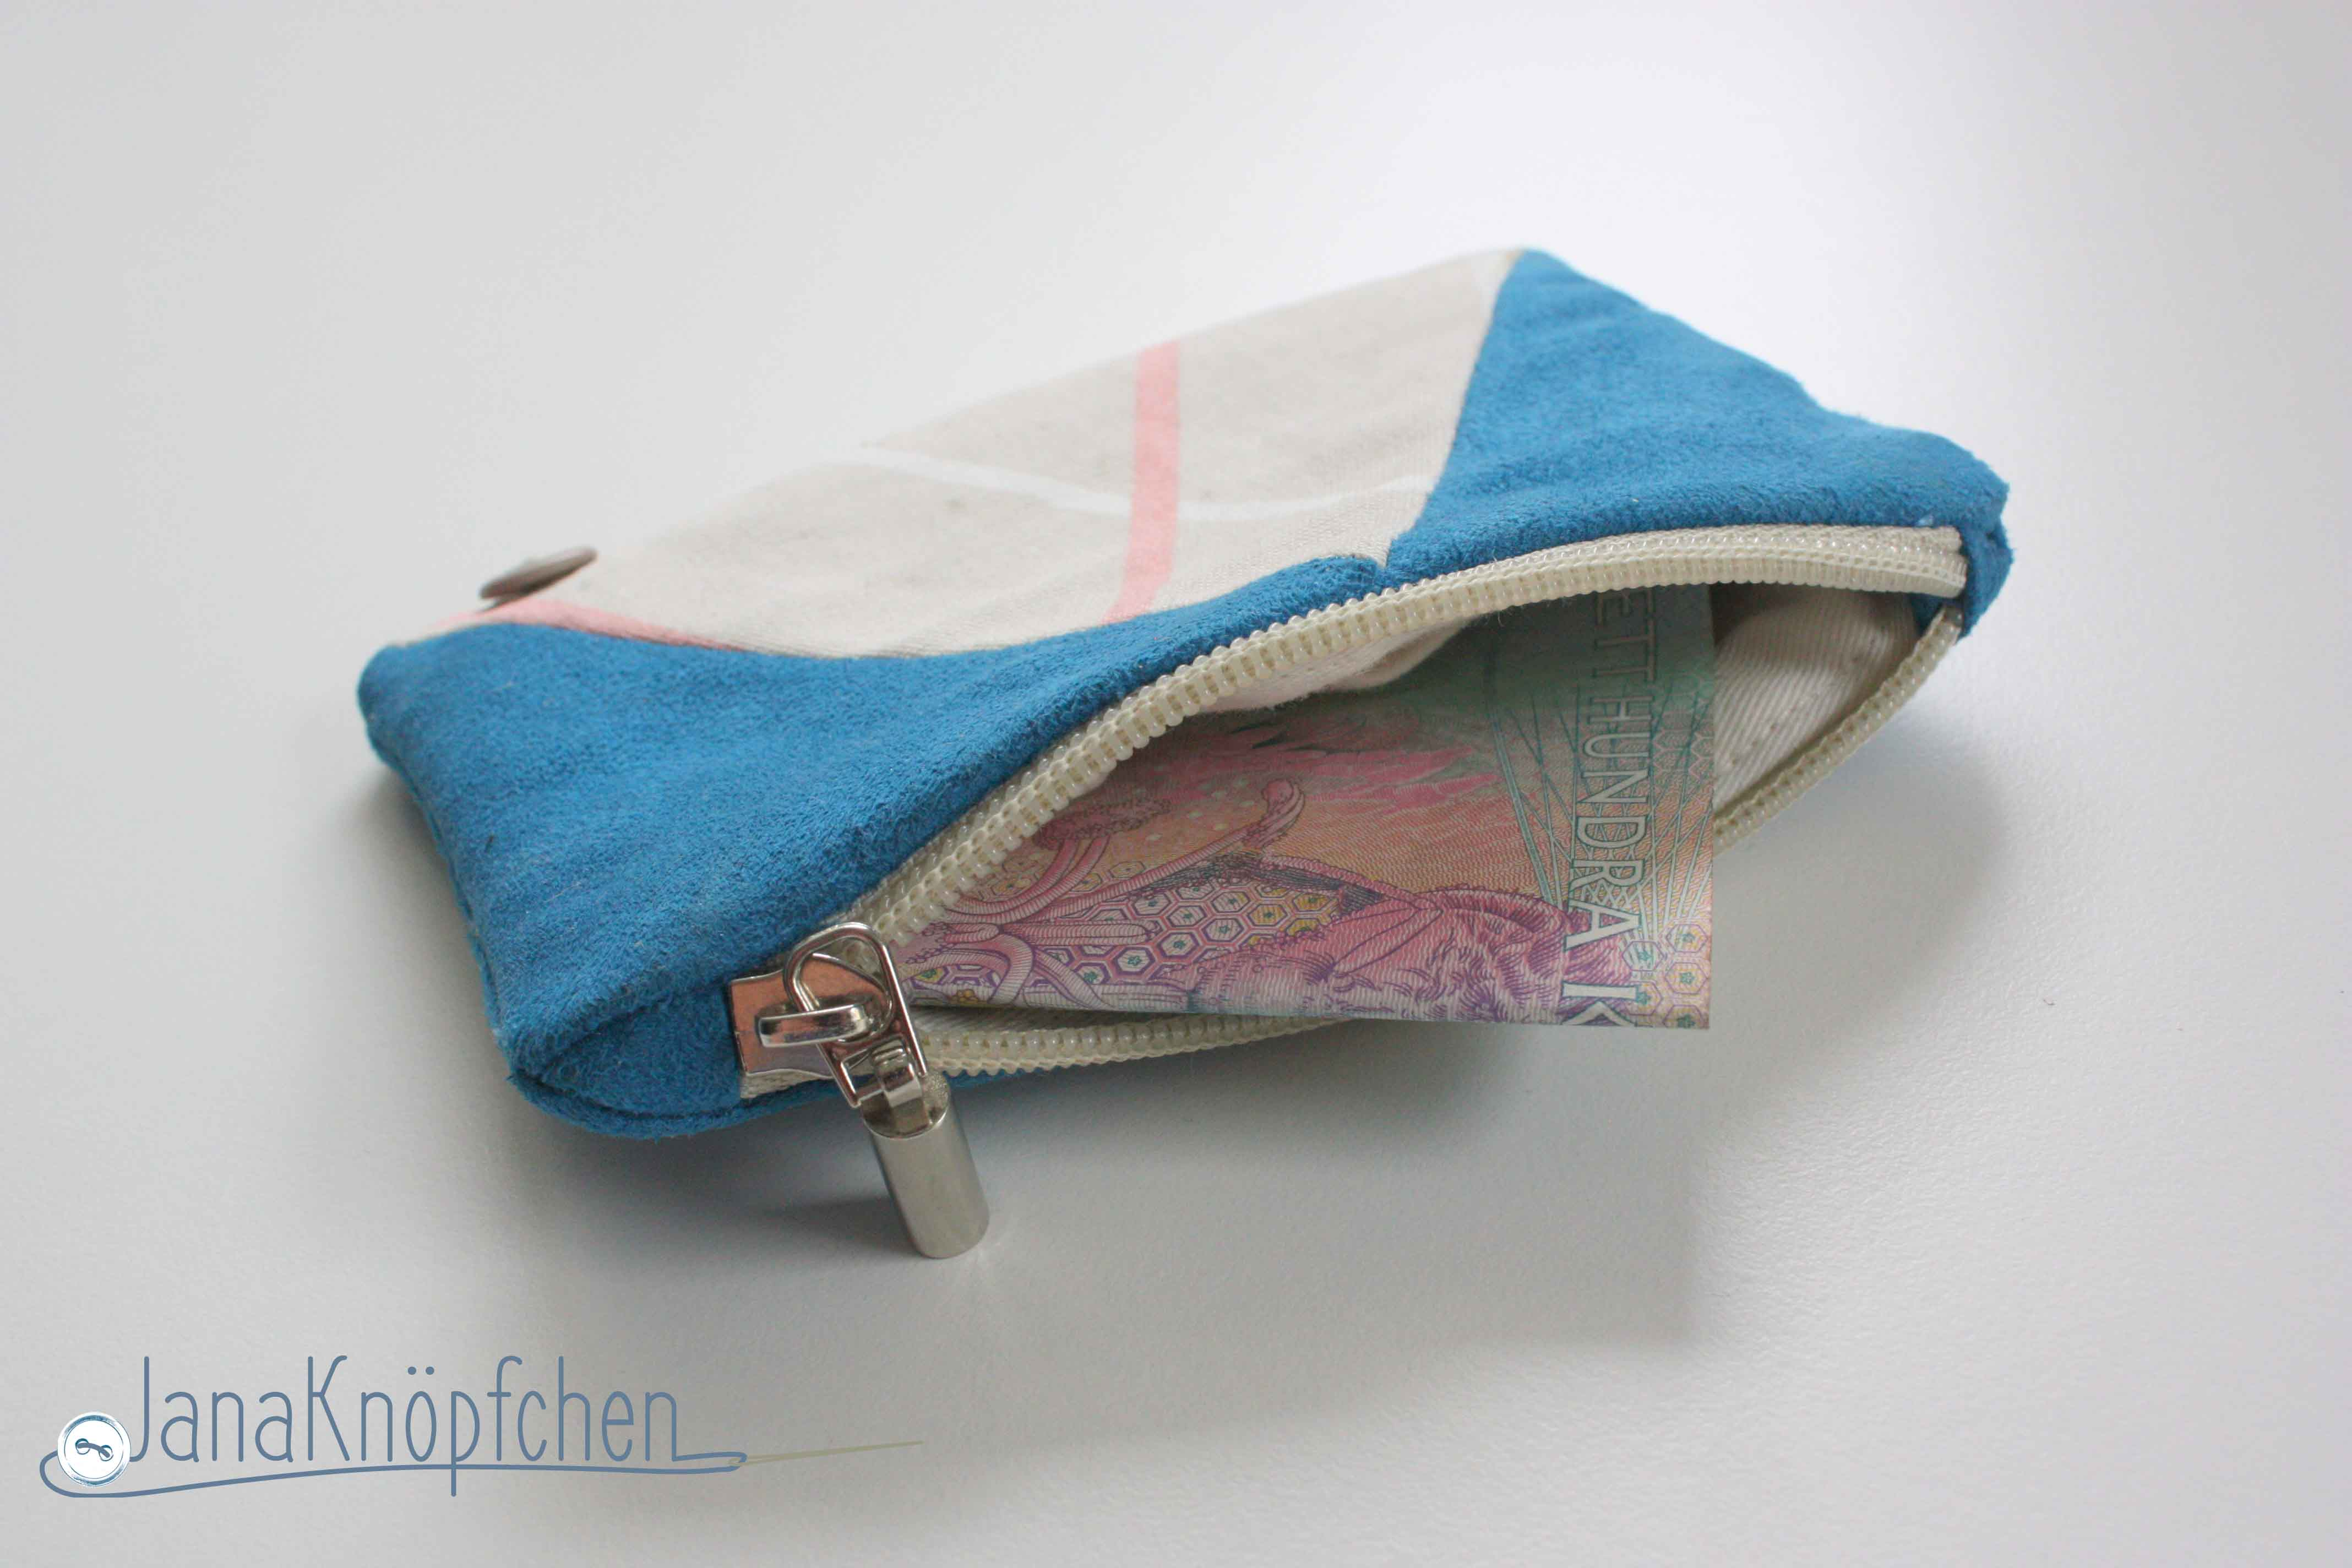 Portemonnaie selbst genaeht. JanaKnoepfchen. Naehblog